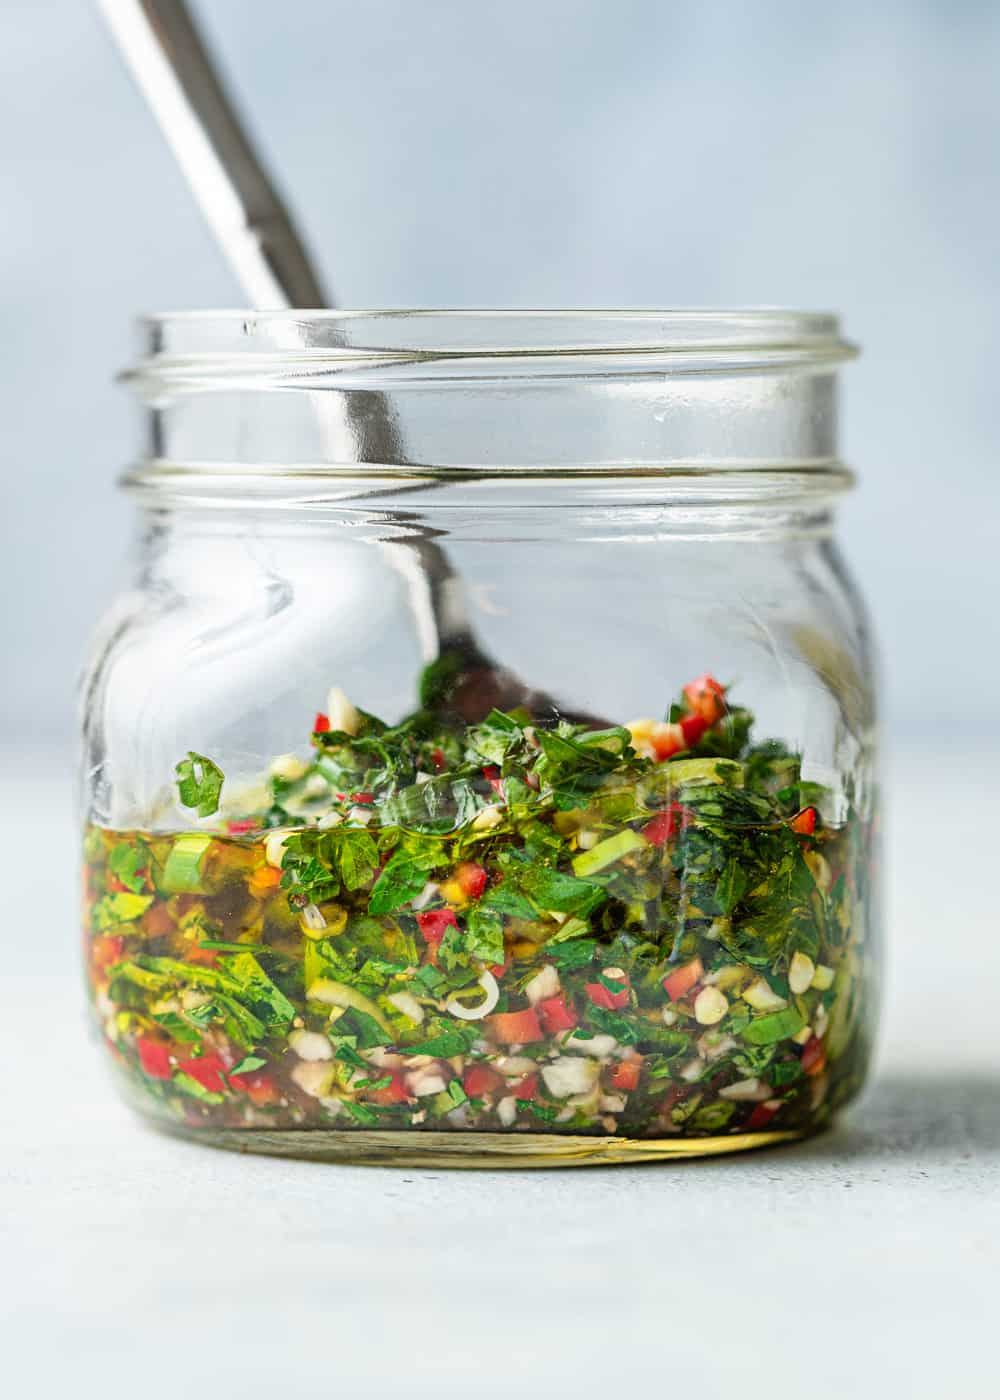 Chimichurri Sauce in glass jar